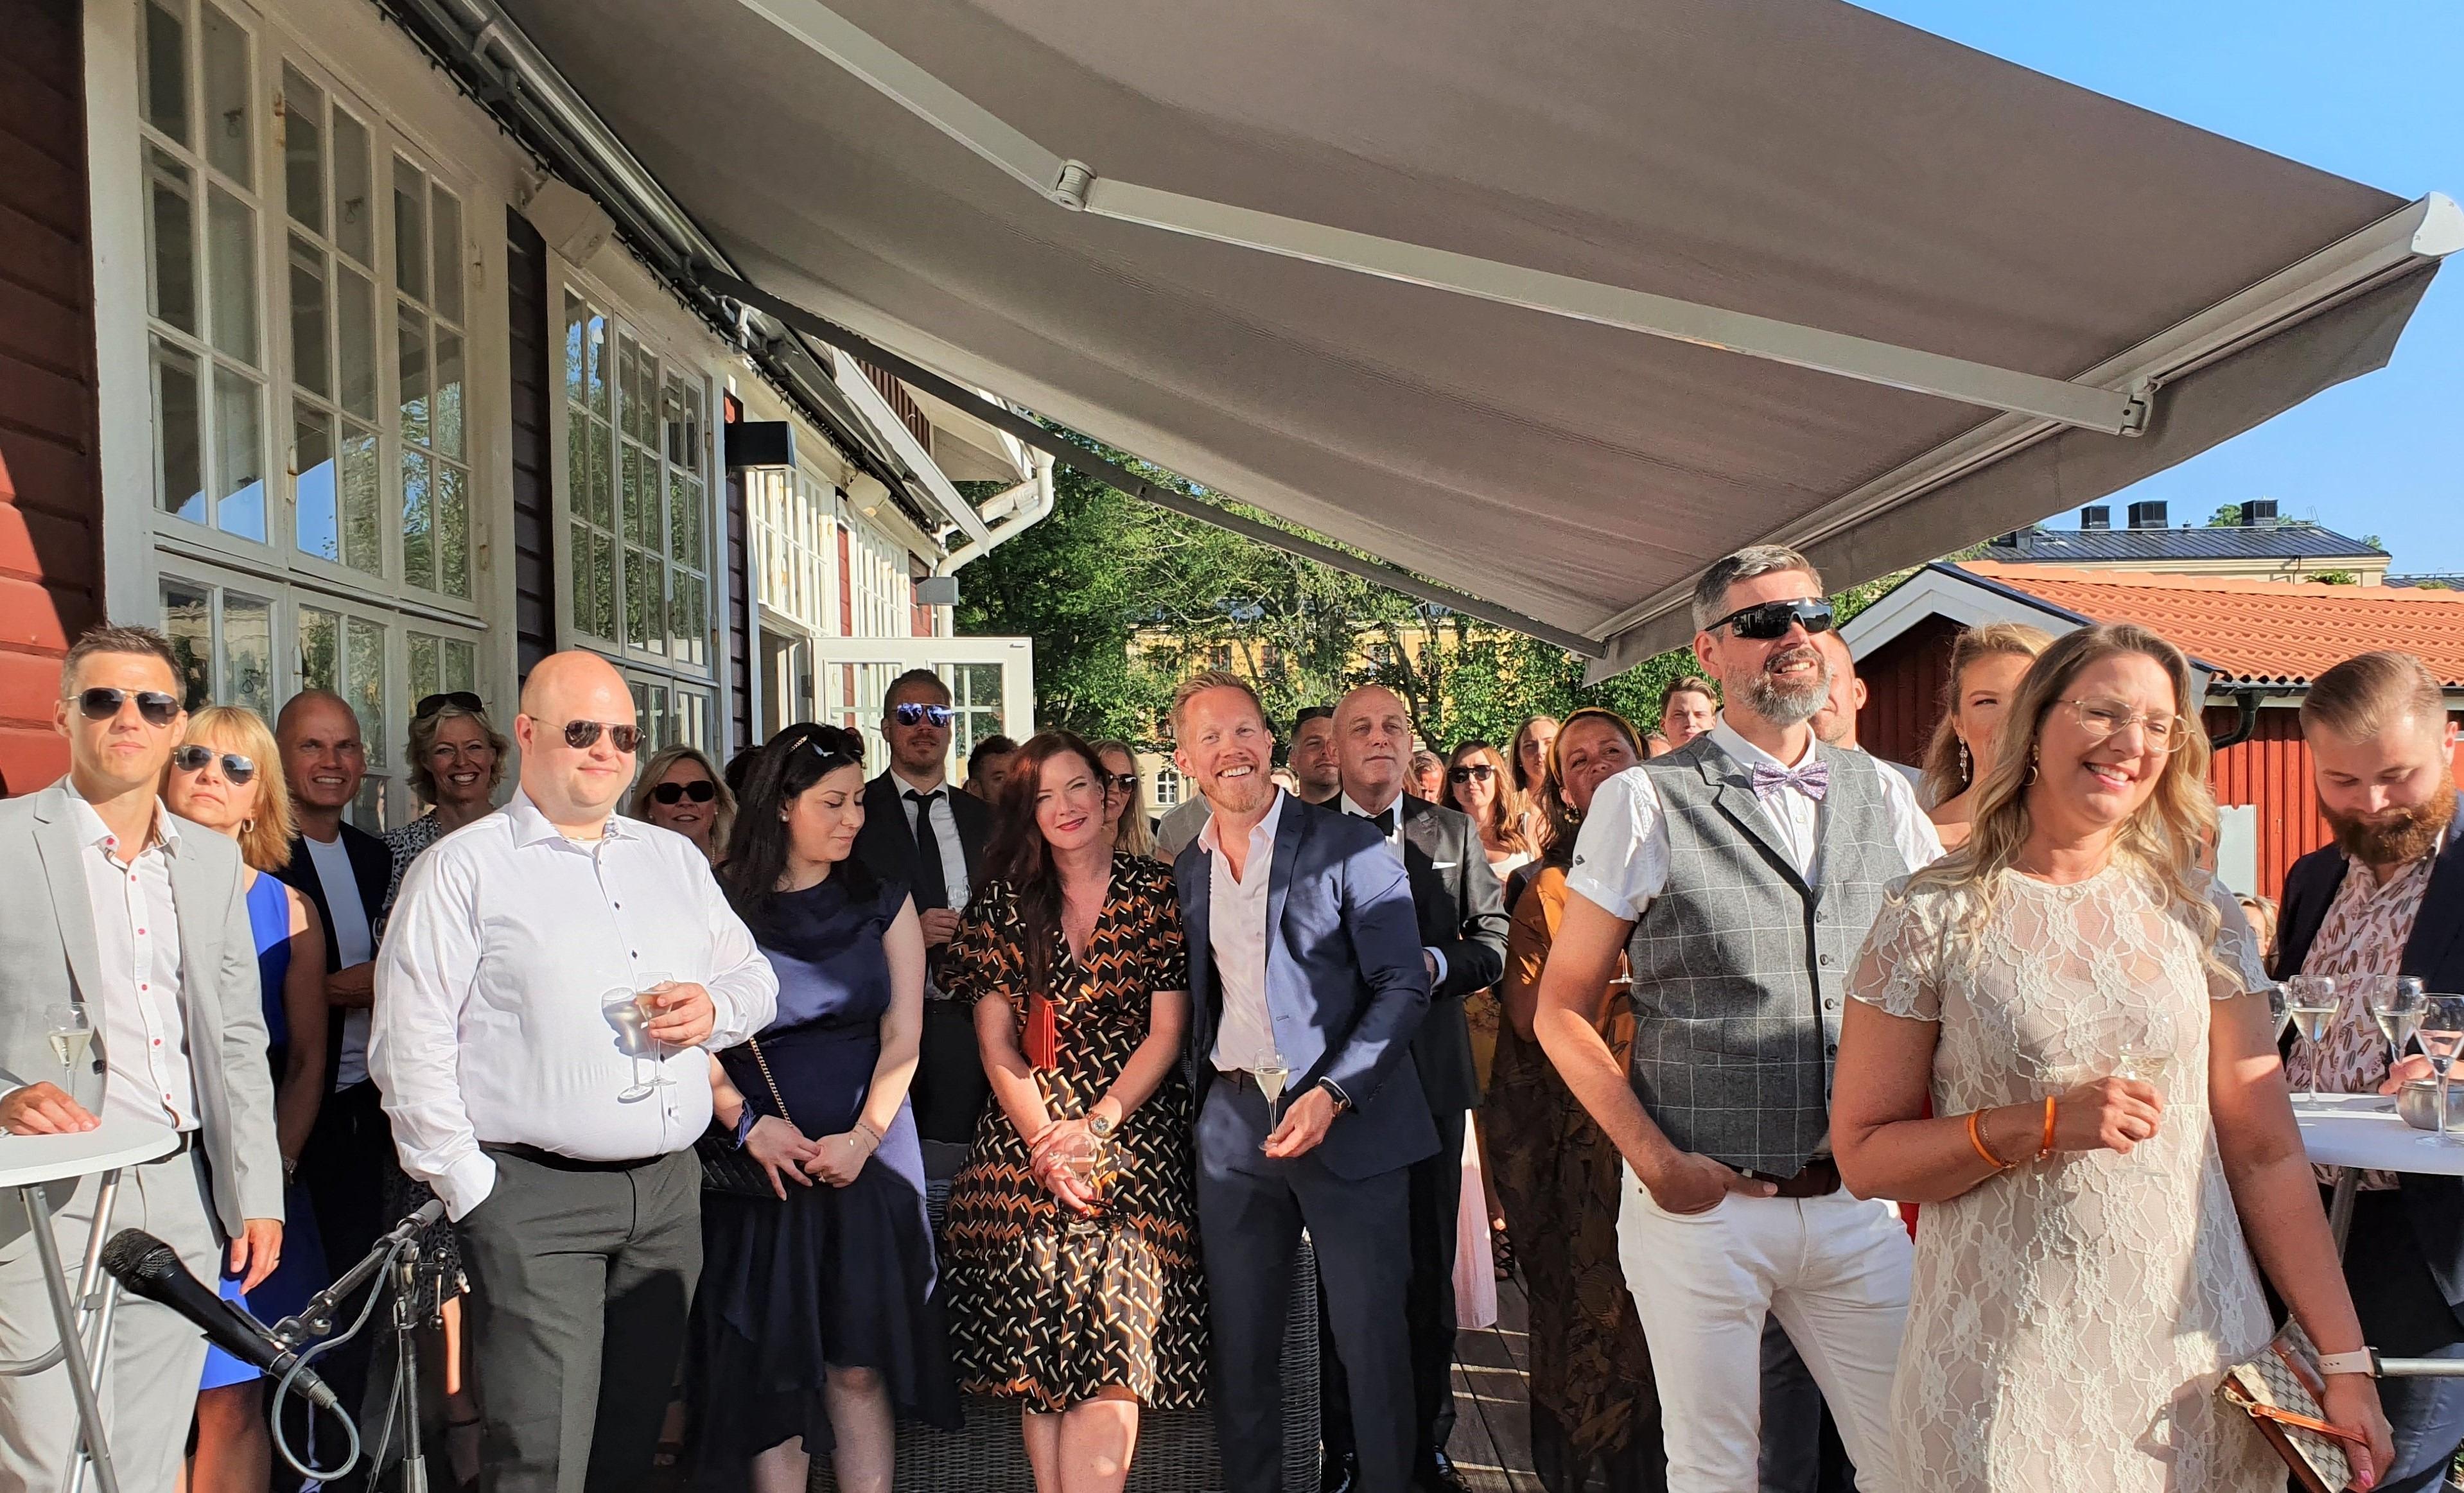 Sommarfest på Elicit, 2019, 20-årsjubileum